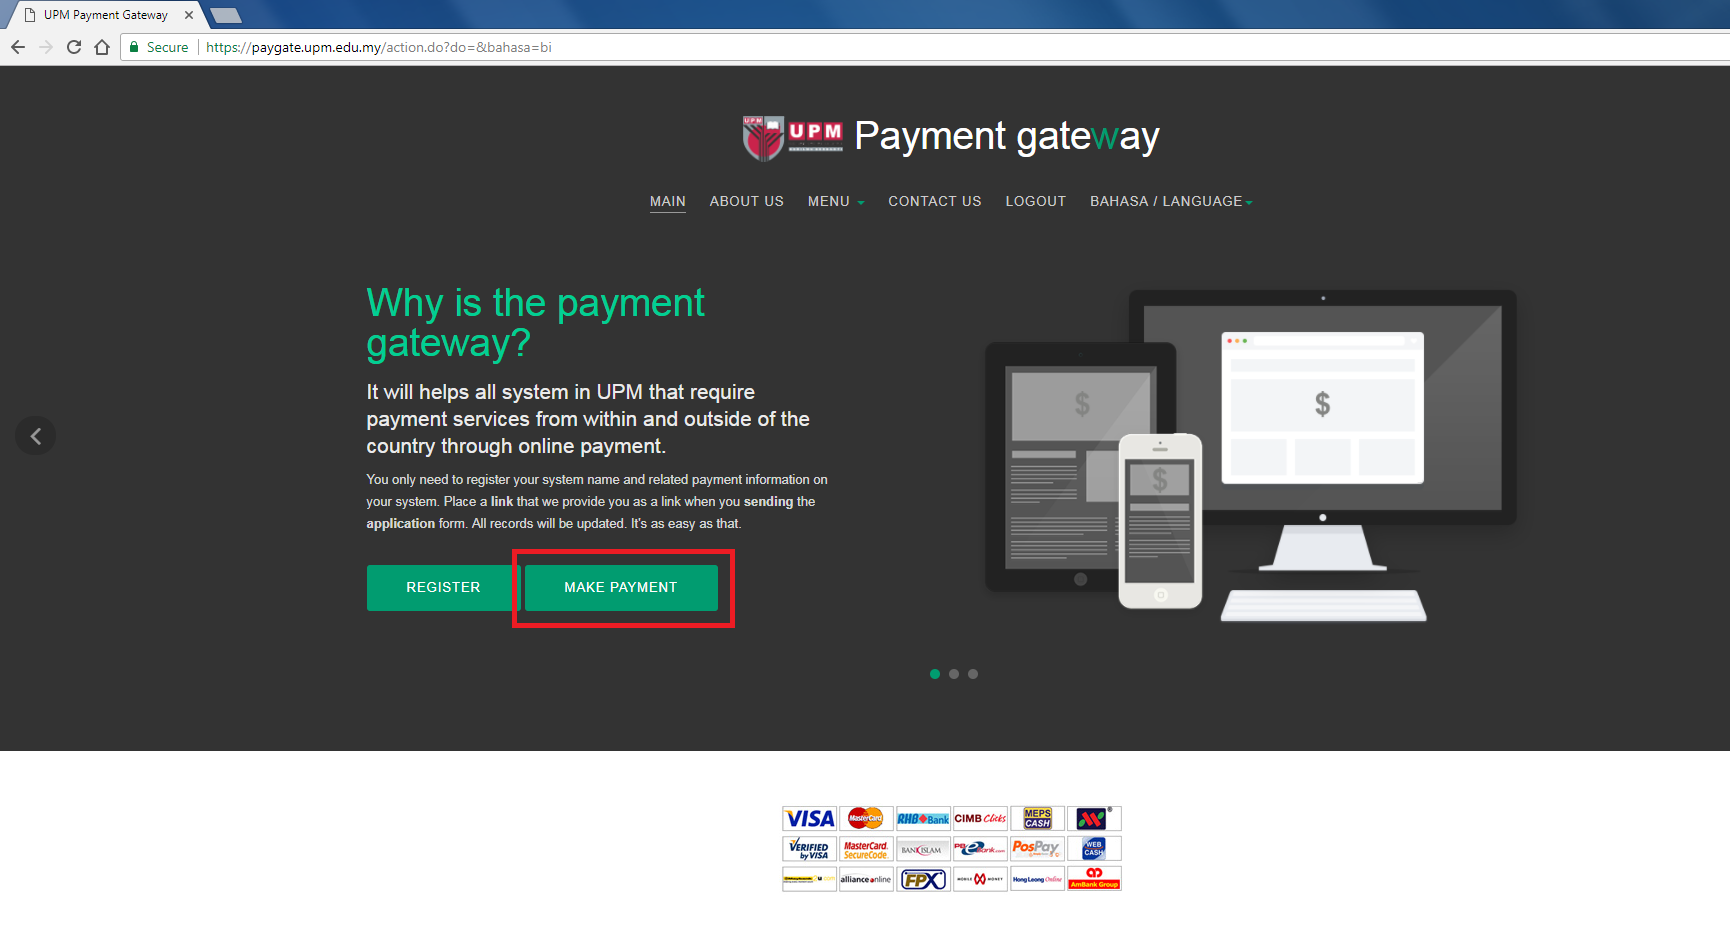 Making Payment Via UPM Payment Gateway   SCHOOL OF GRADUATE STUDIES